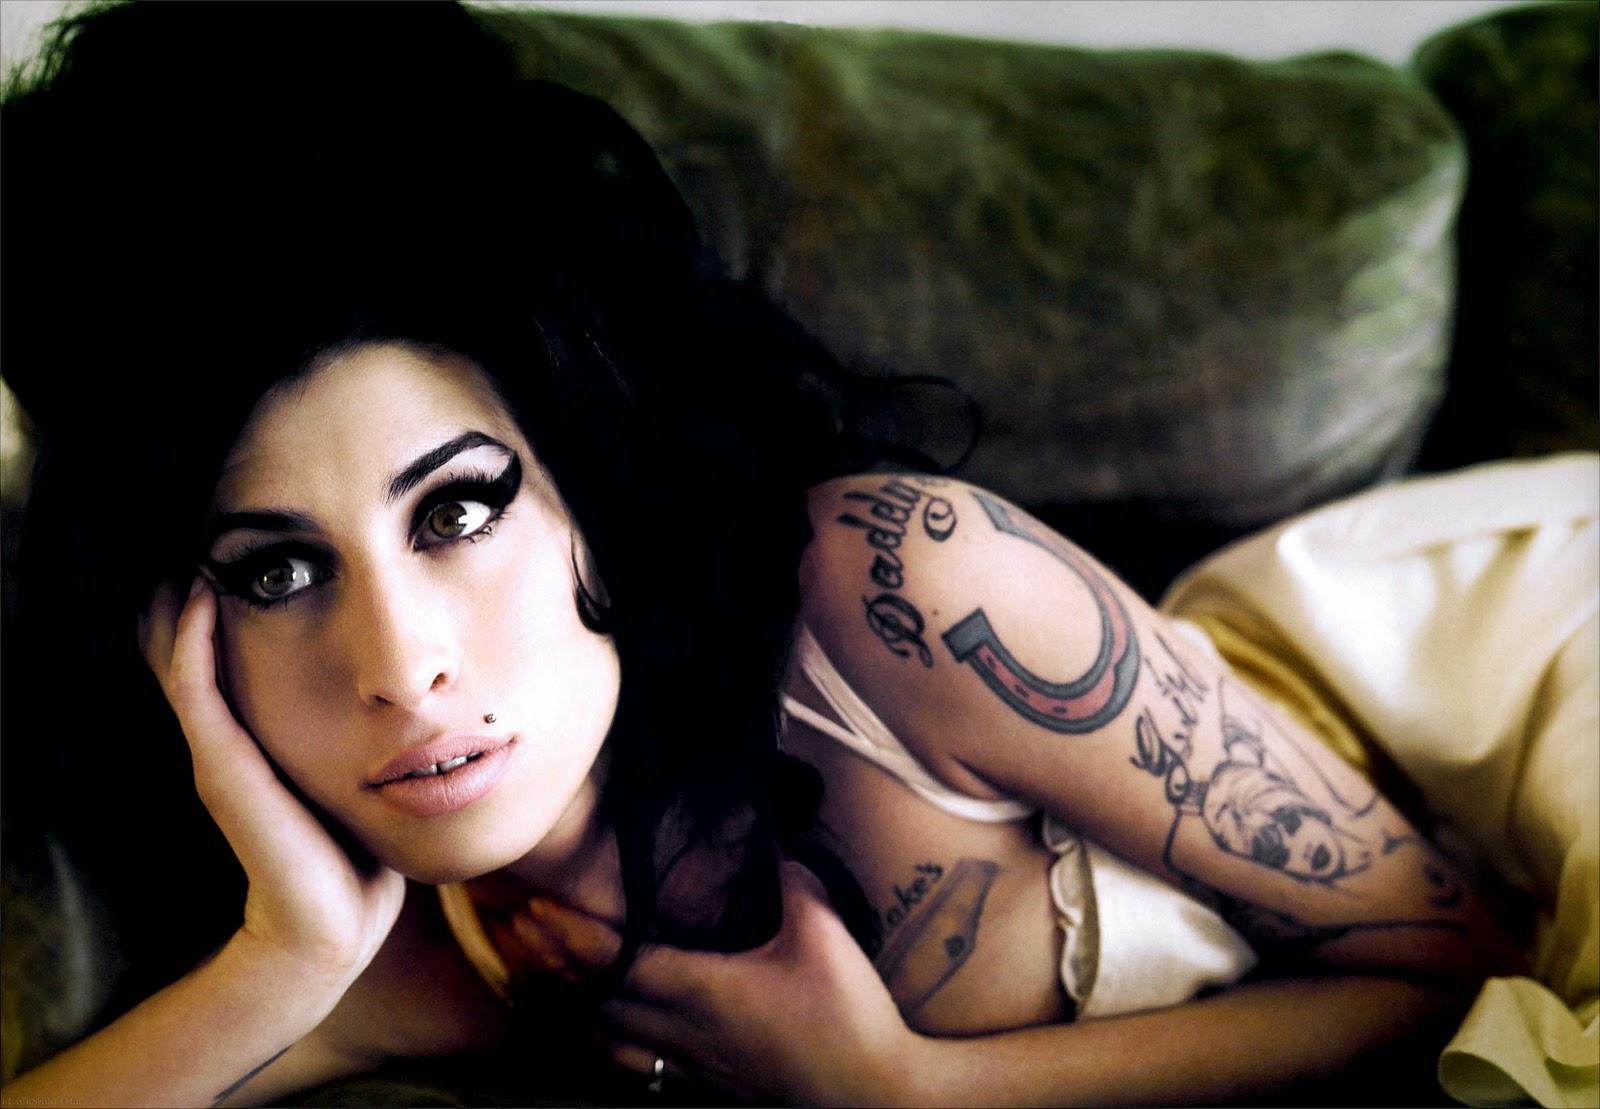 http://4.bp.blogspot.com/_OwfwVsGnJeA/TTOfv0F3OJI/AAAAAAAAARI/pPhD4IxqgfQ/s1600/Amy-Winehouse.jpg